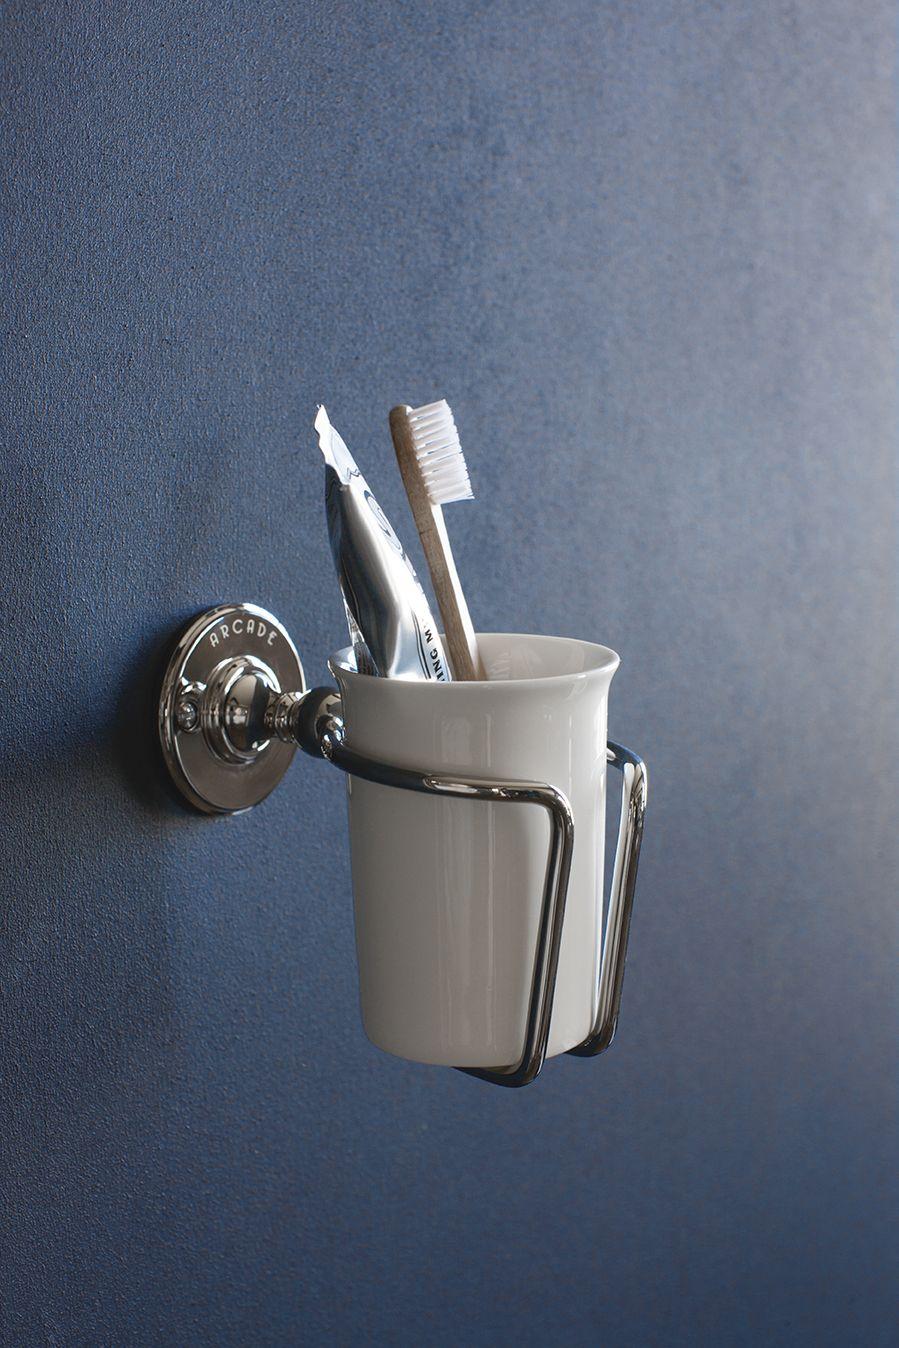 It S All In The Details Luxurybathroom Mytimelessbathroom Arcadebathrooms With Images Mug Holder China Mugs Bathroom Furnishings